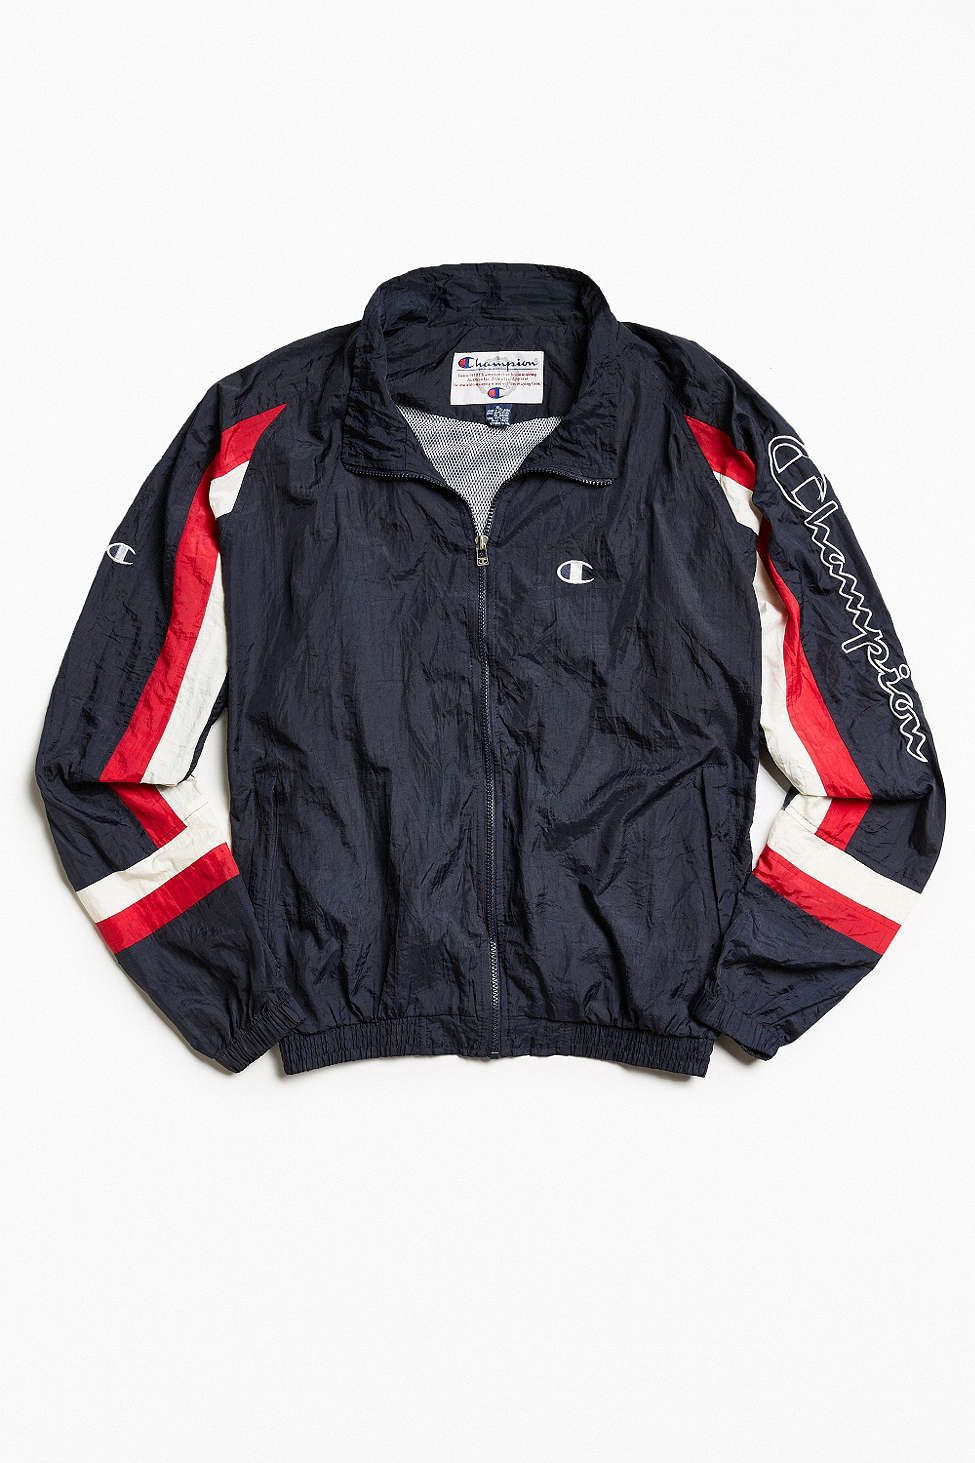 78bad23d122 Vintage Champion Windbreaker Jacket | retro sports jkt | Vintage ...